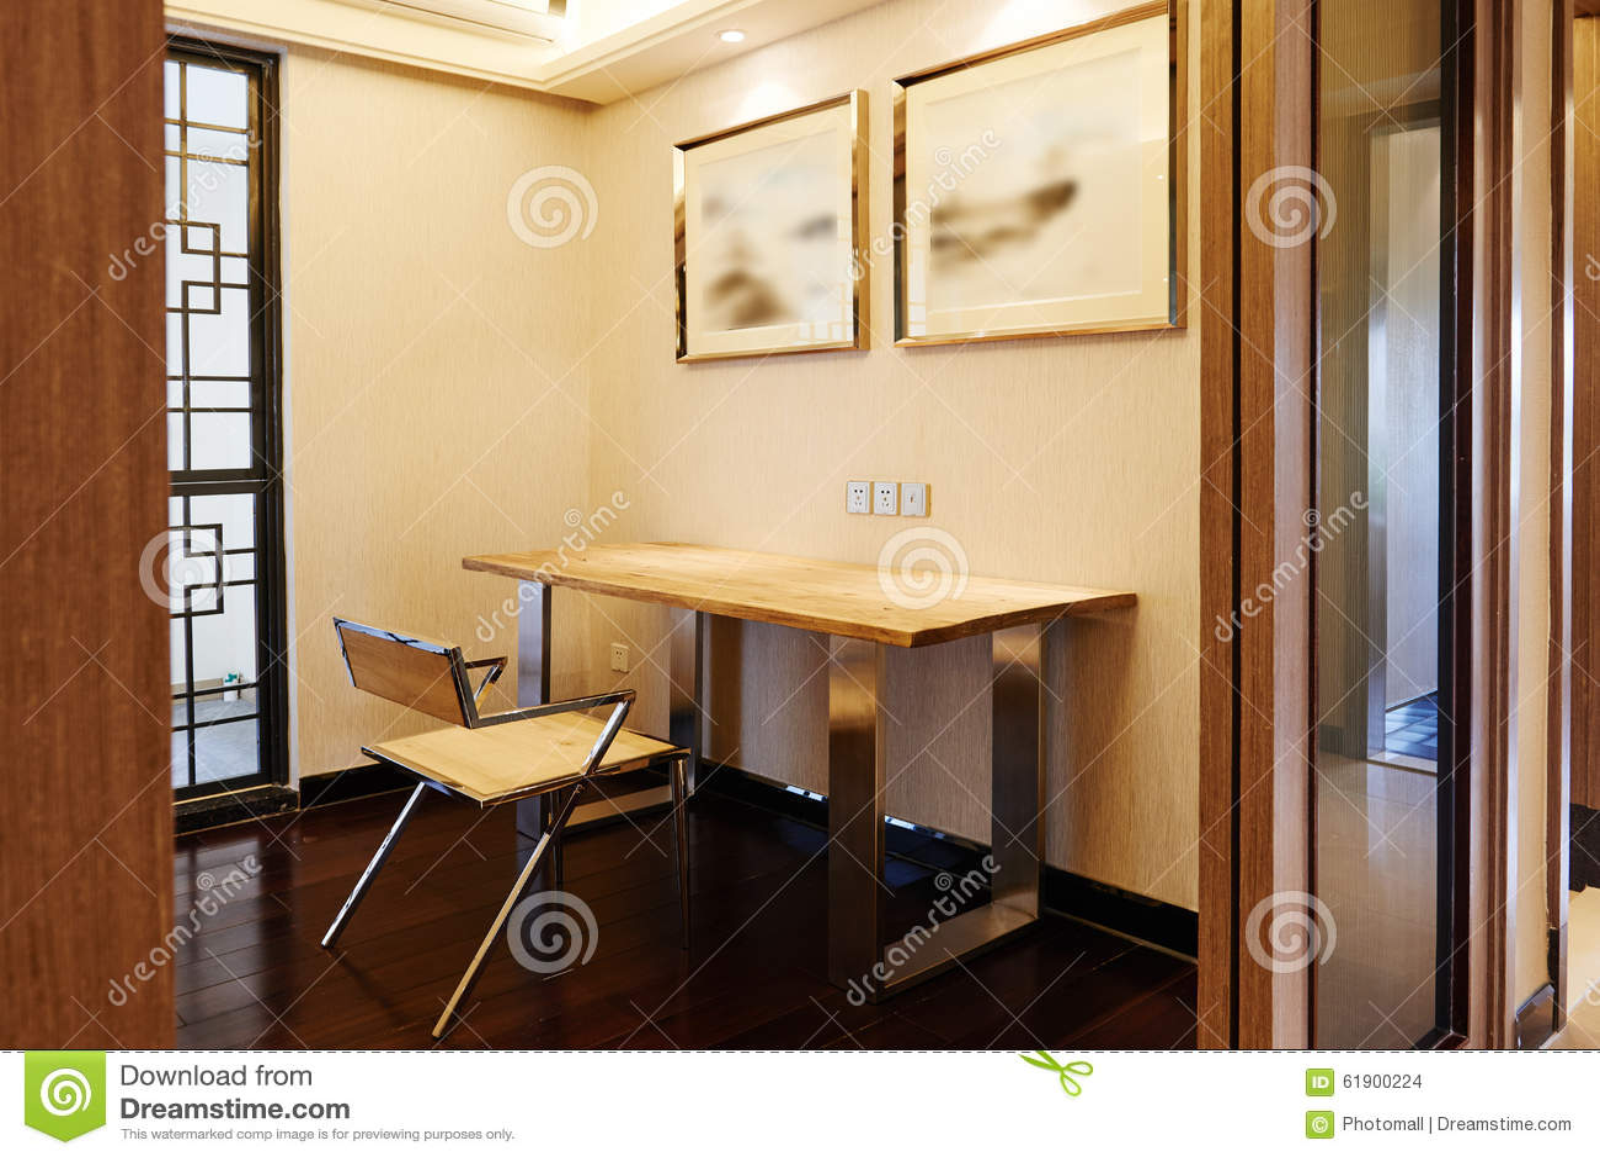 Oriental study room